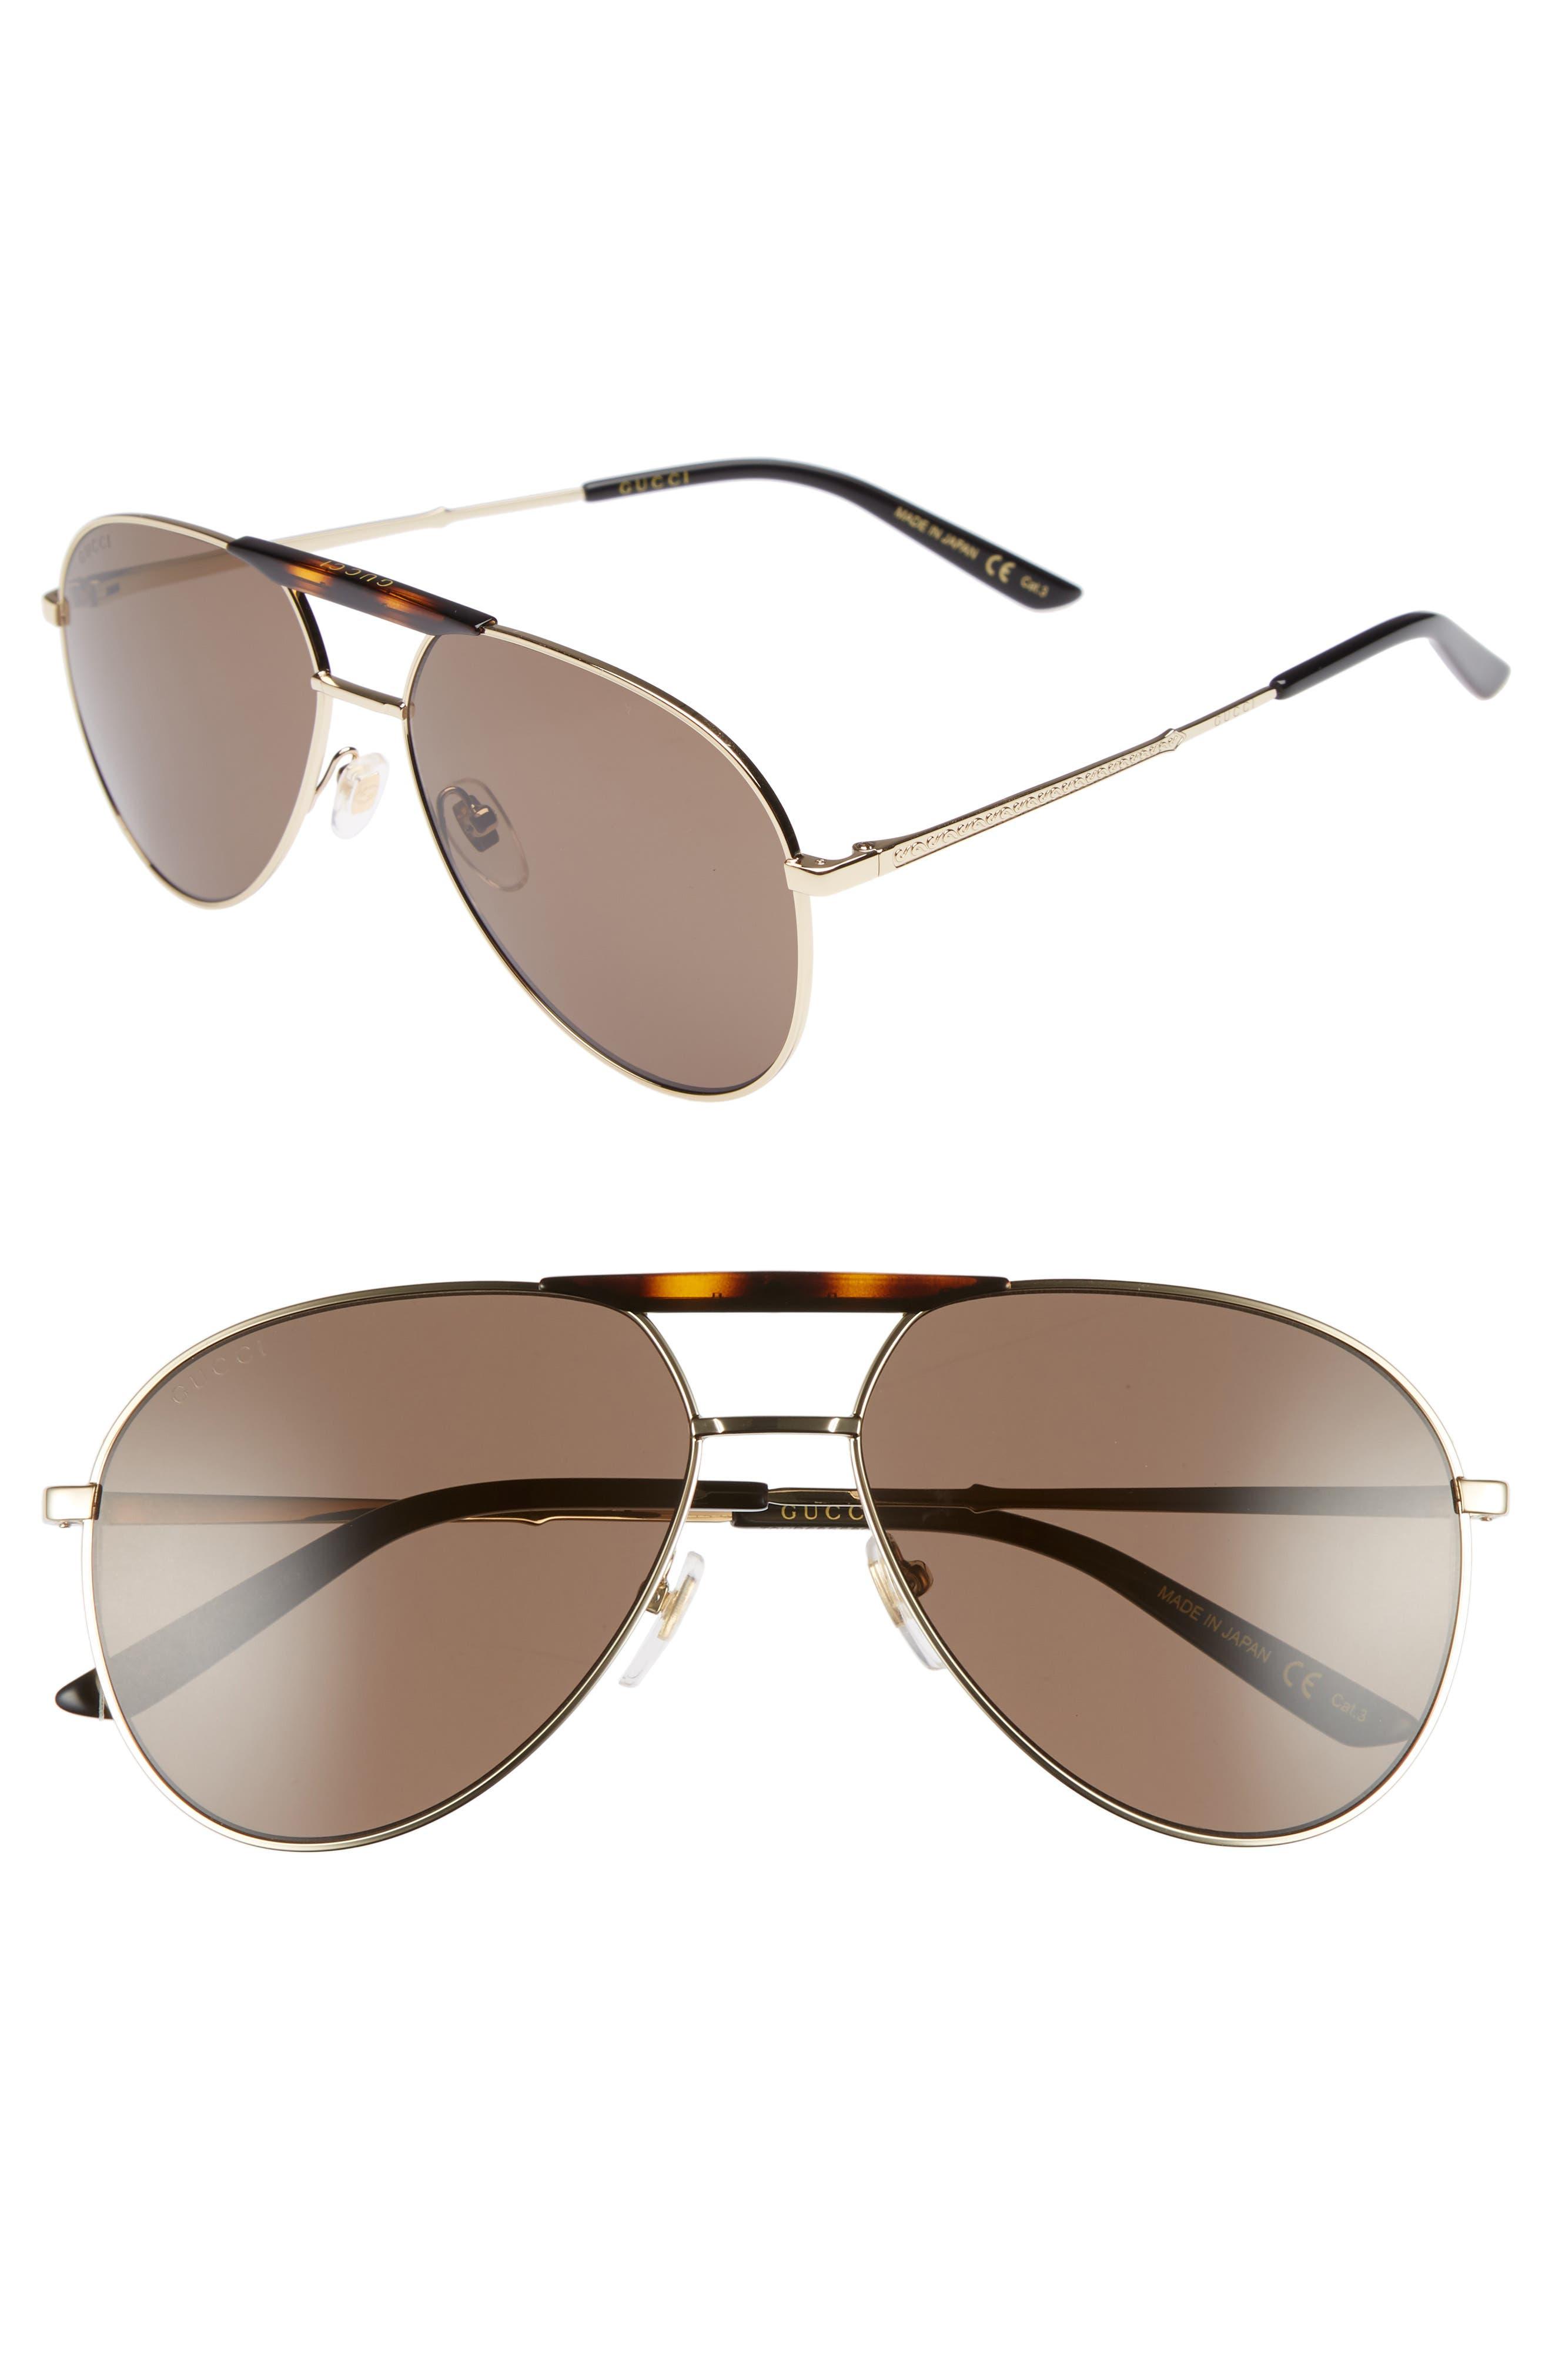 GUCCI, Cruise 59mm Aviator Sunglasses, Main thumbnail 1, color, GOLD/ BLACK